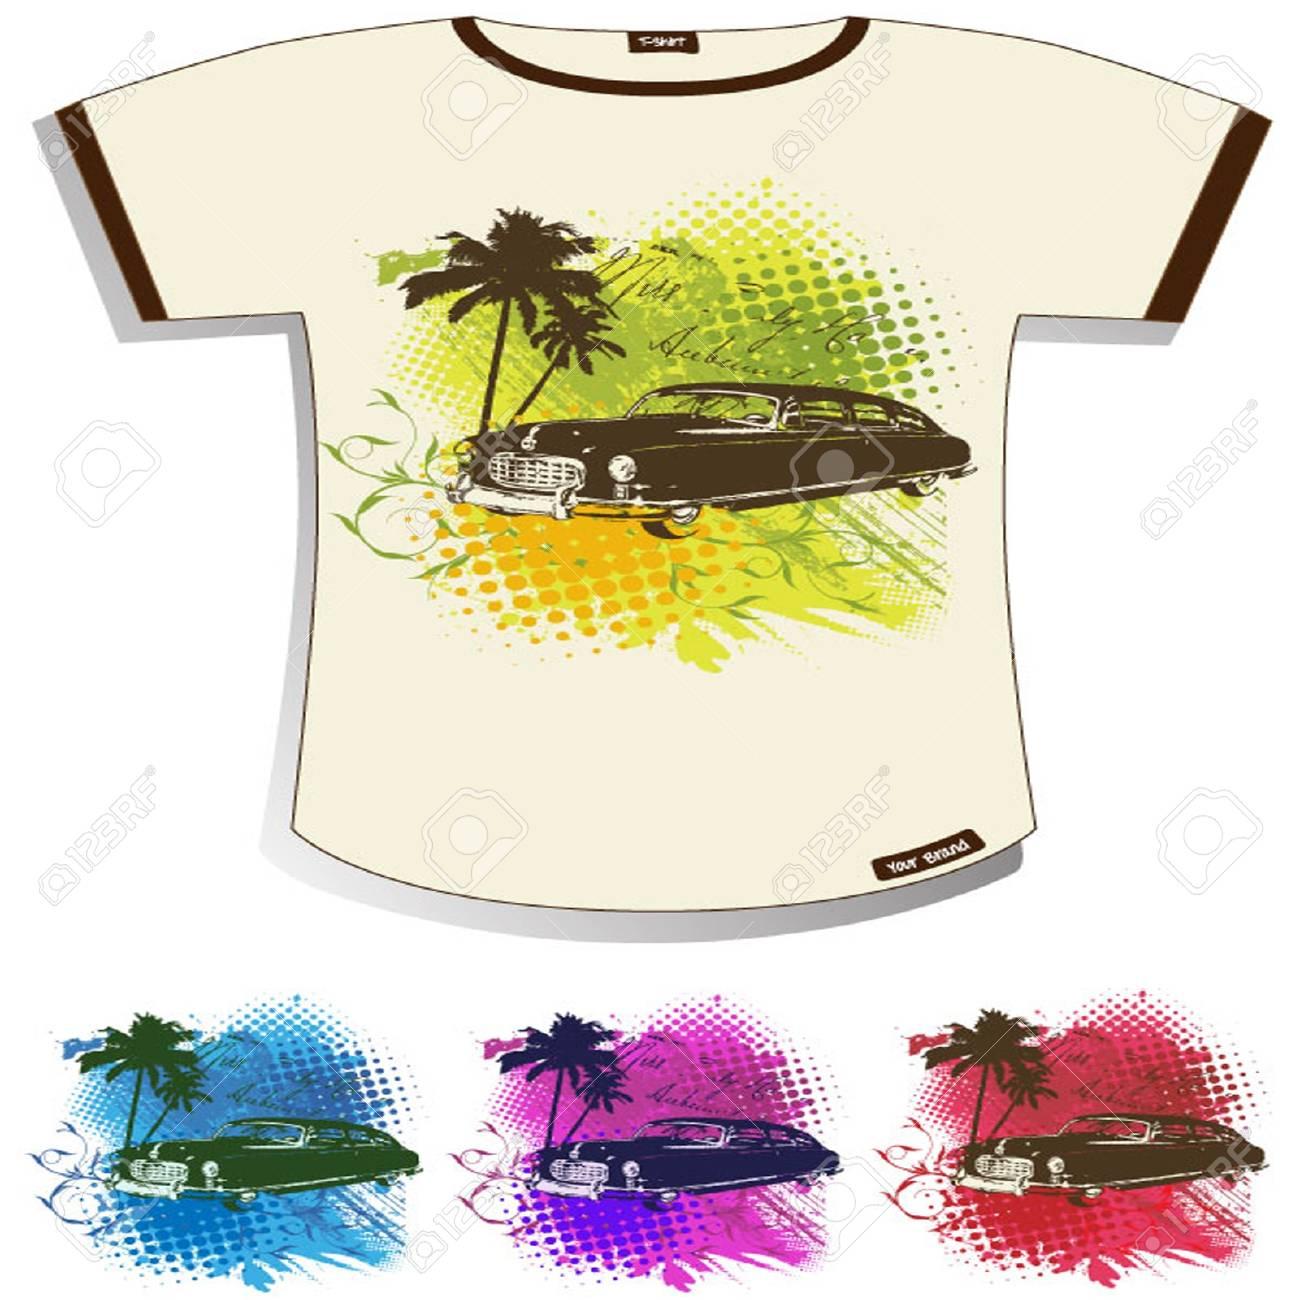 Abstract Grunge T-shirt Design Stock Vector - 13536928